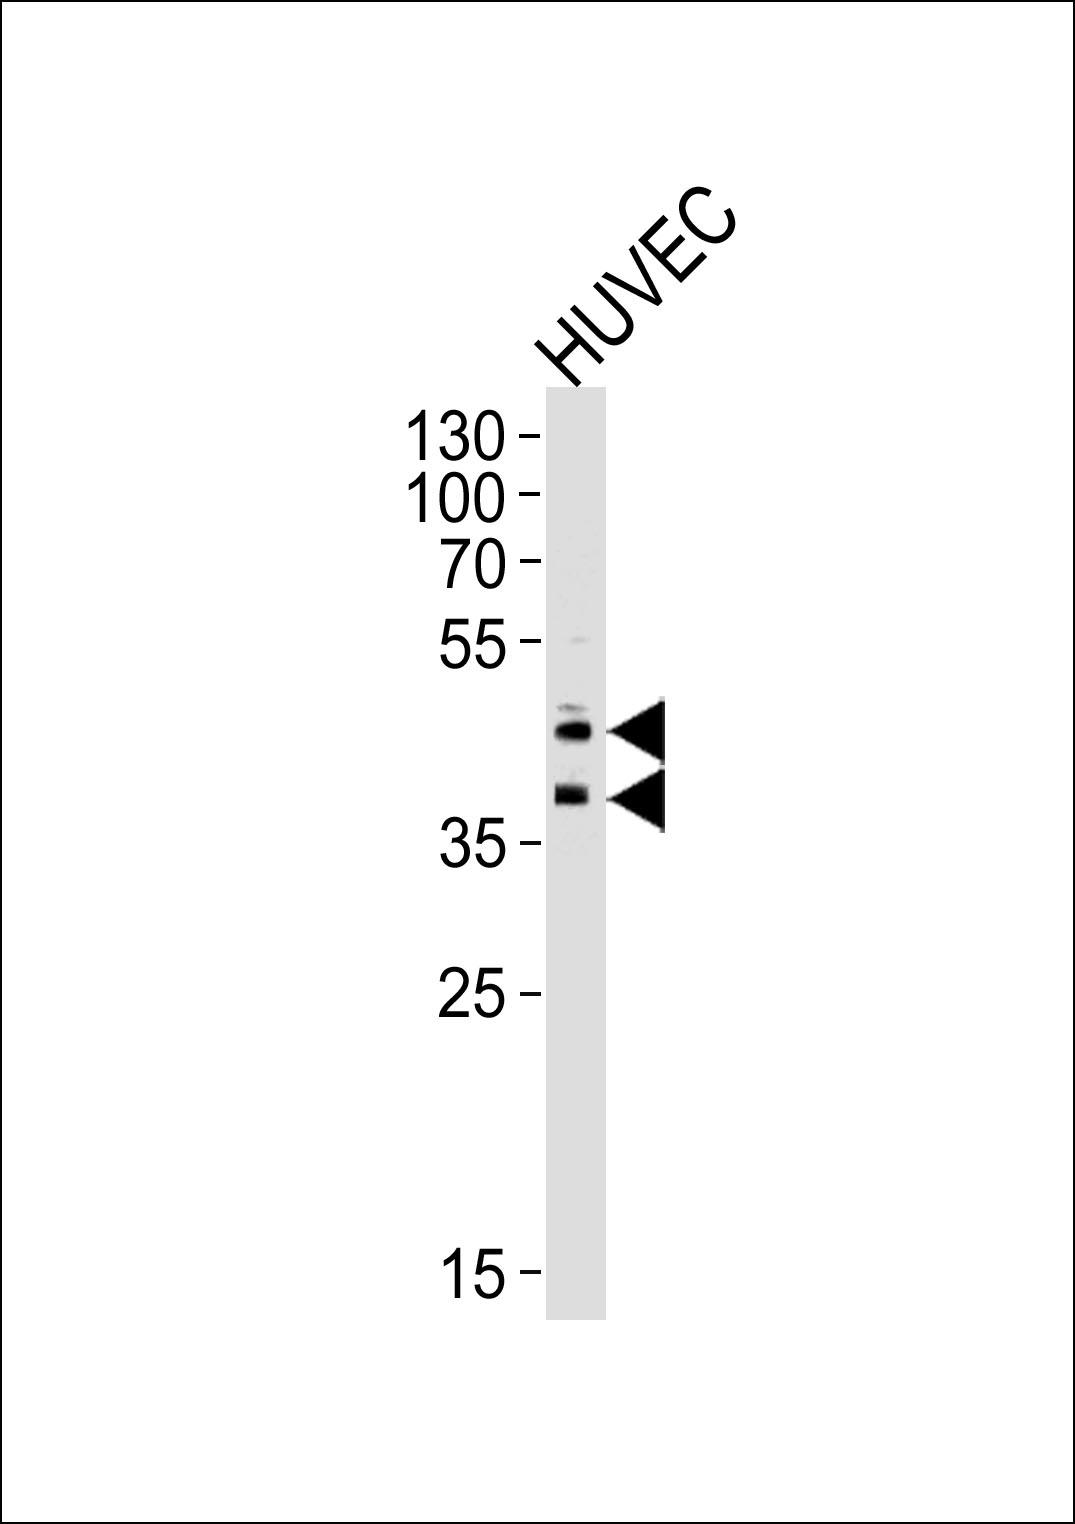 CD34 (132CT29.1.5) Monoclonal Antibody